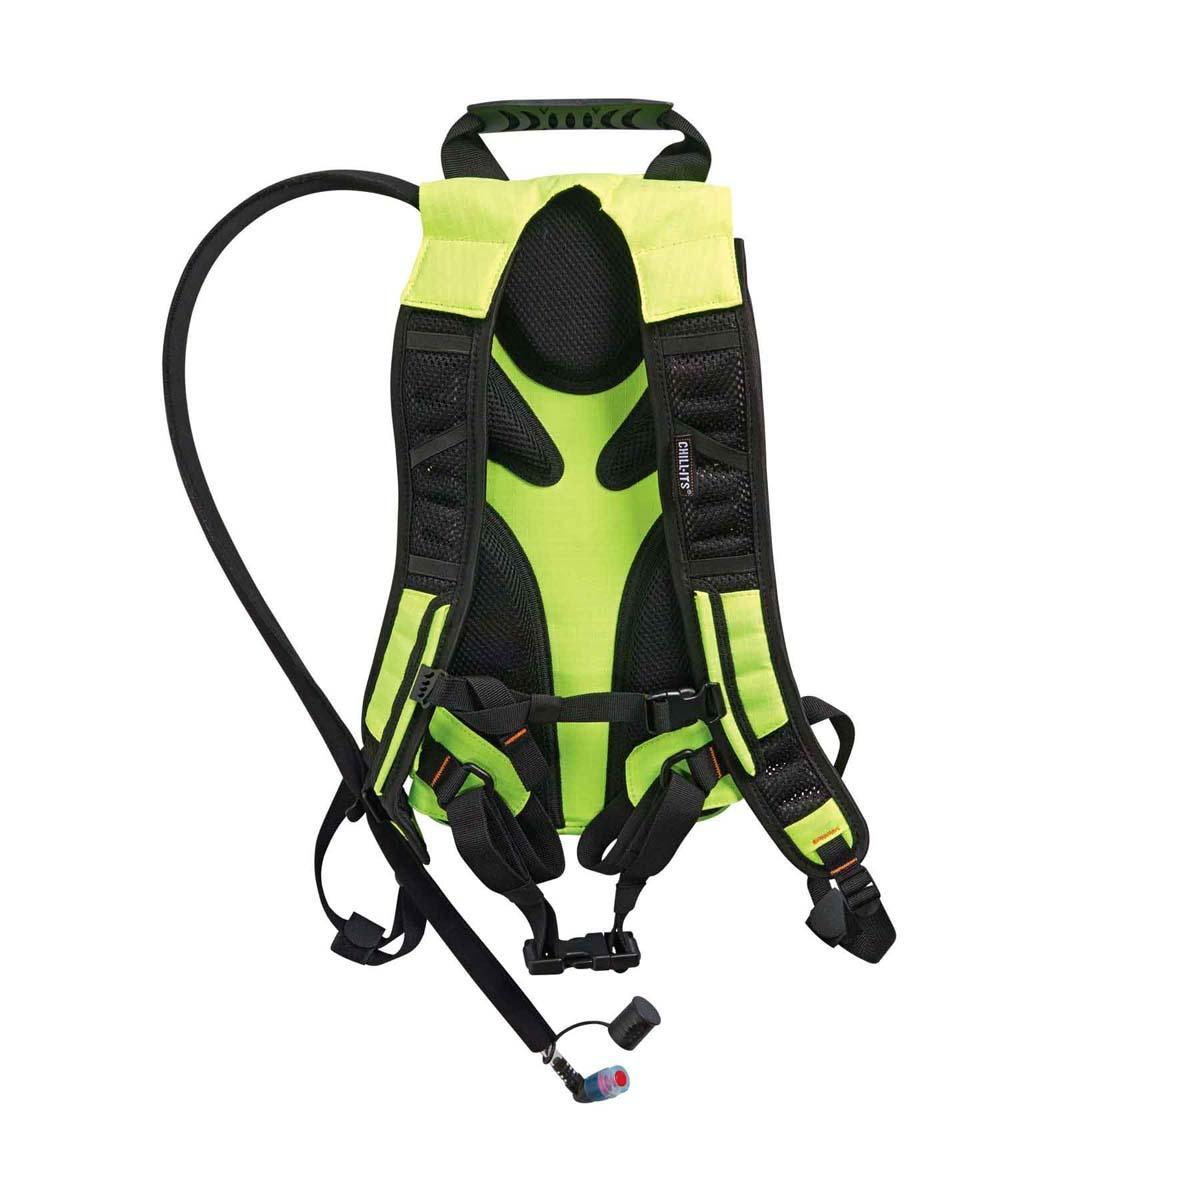 5157 3 ltr Hi-Vis Lime Premium Cargo Hydration Pack